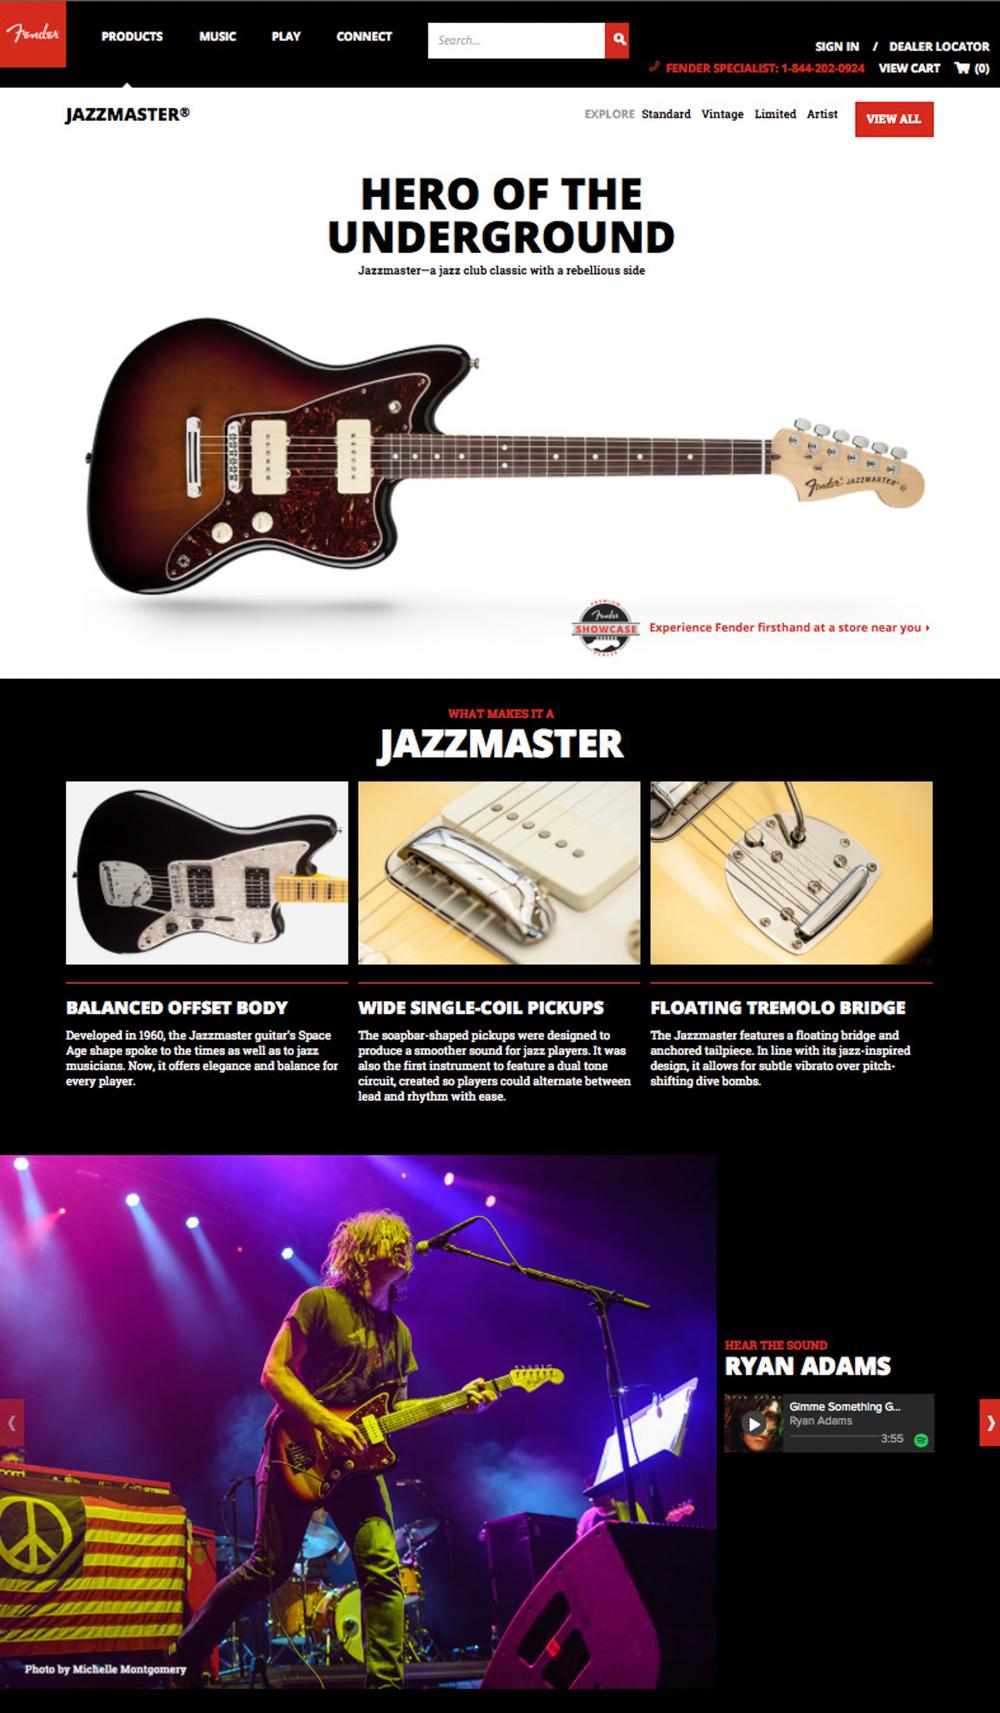 jazzmaster.jpg